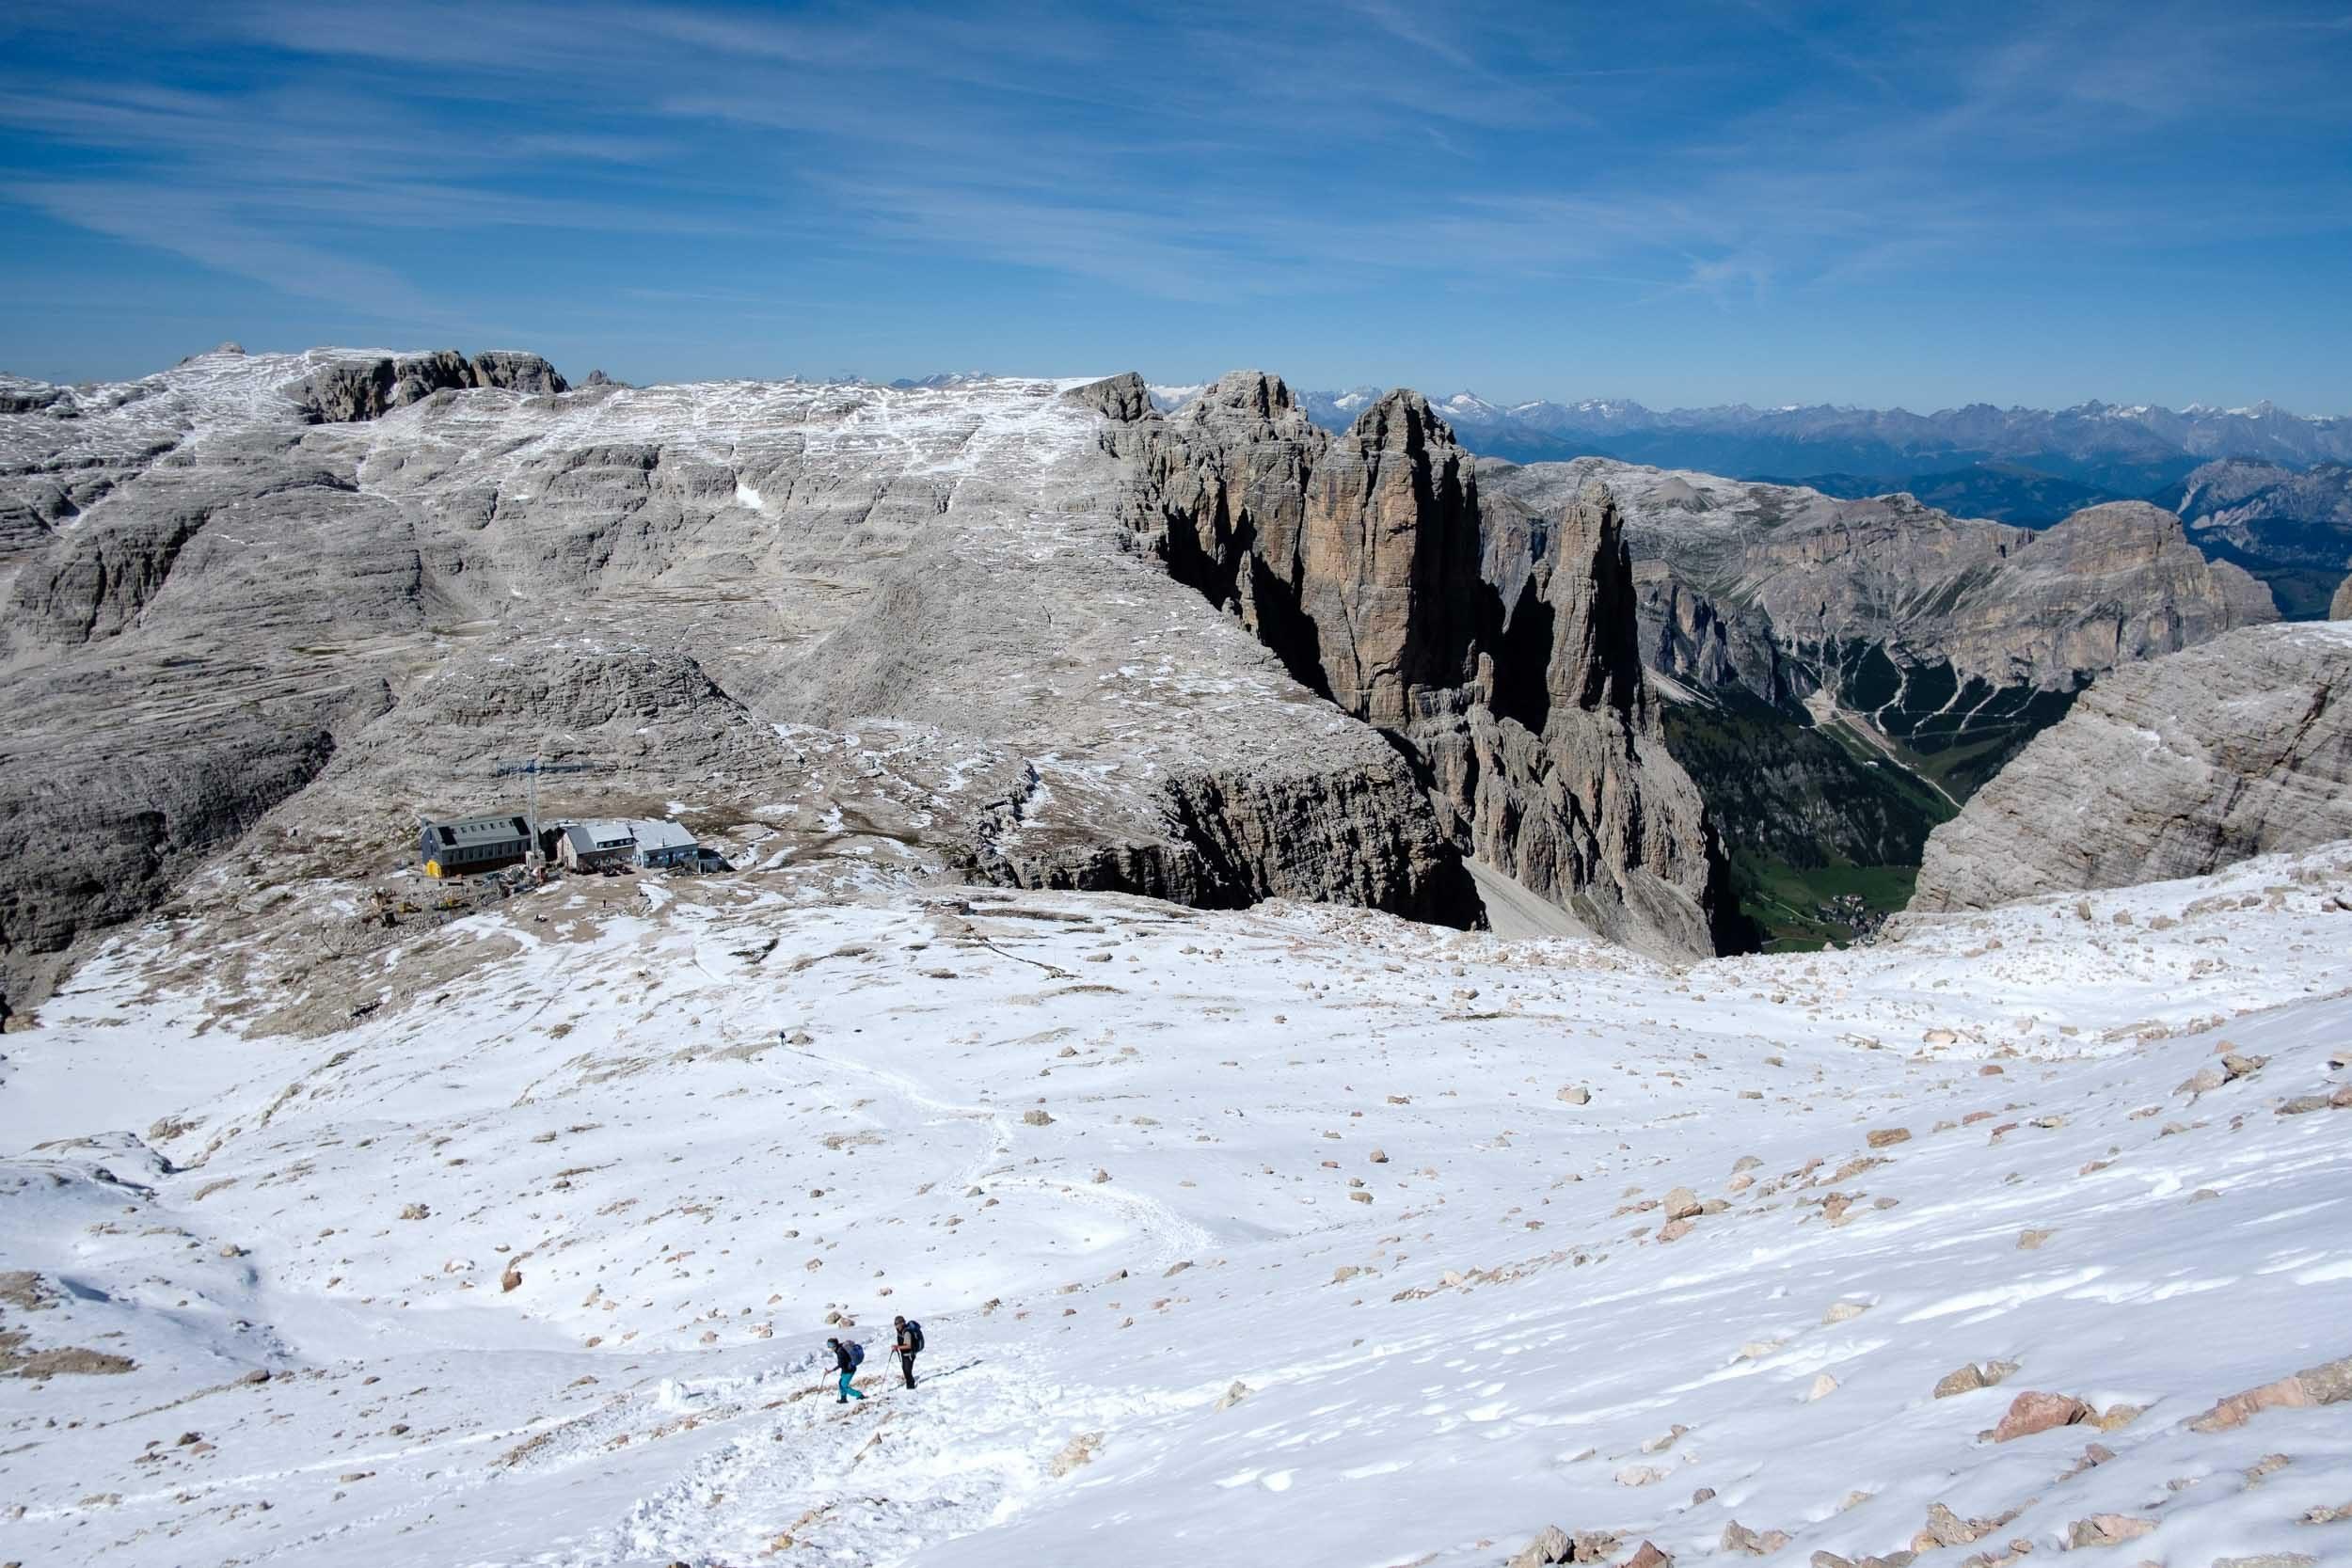 Rifugi Boé, Sella, Dolomiten, Italien